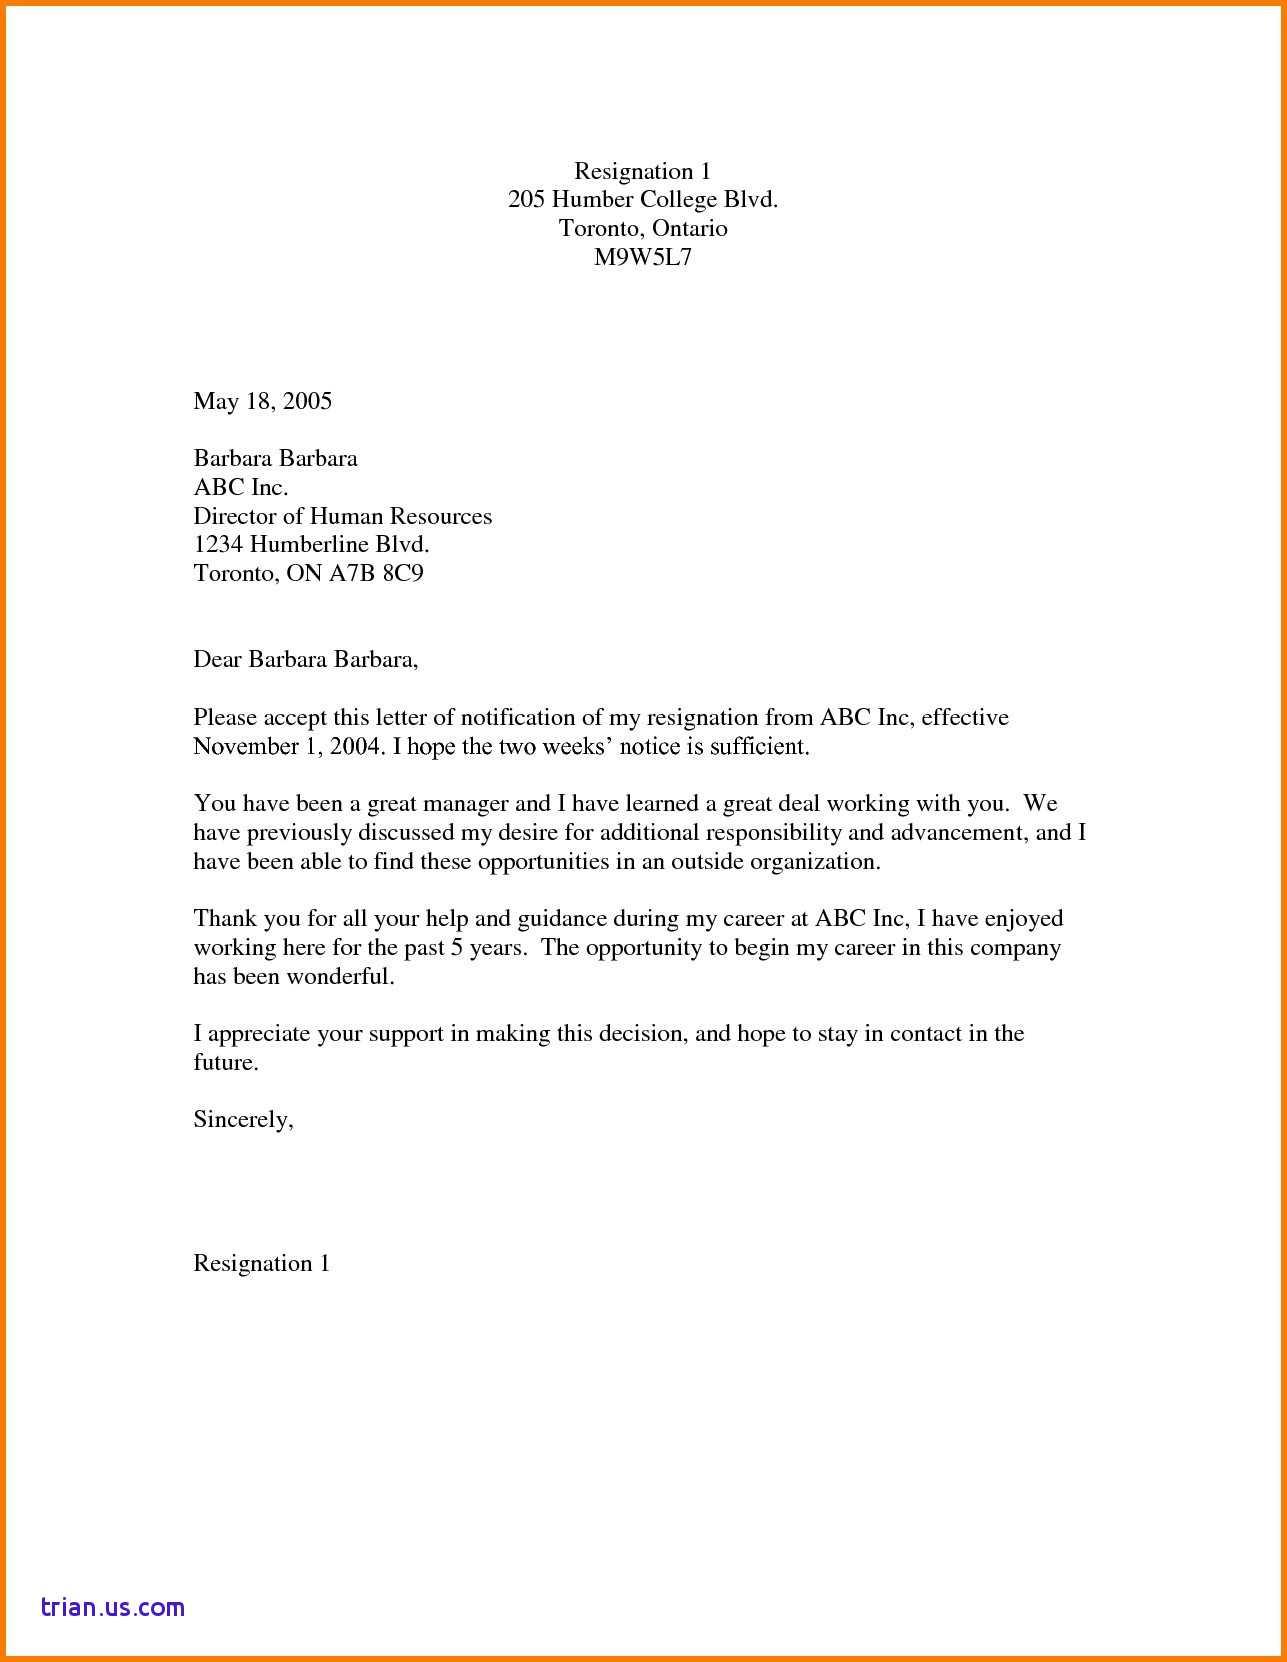 Debt Harassment Template Letter - Business Debt Collection Letter Template New top Debt Collection